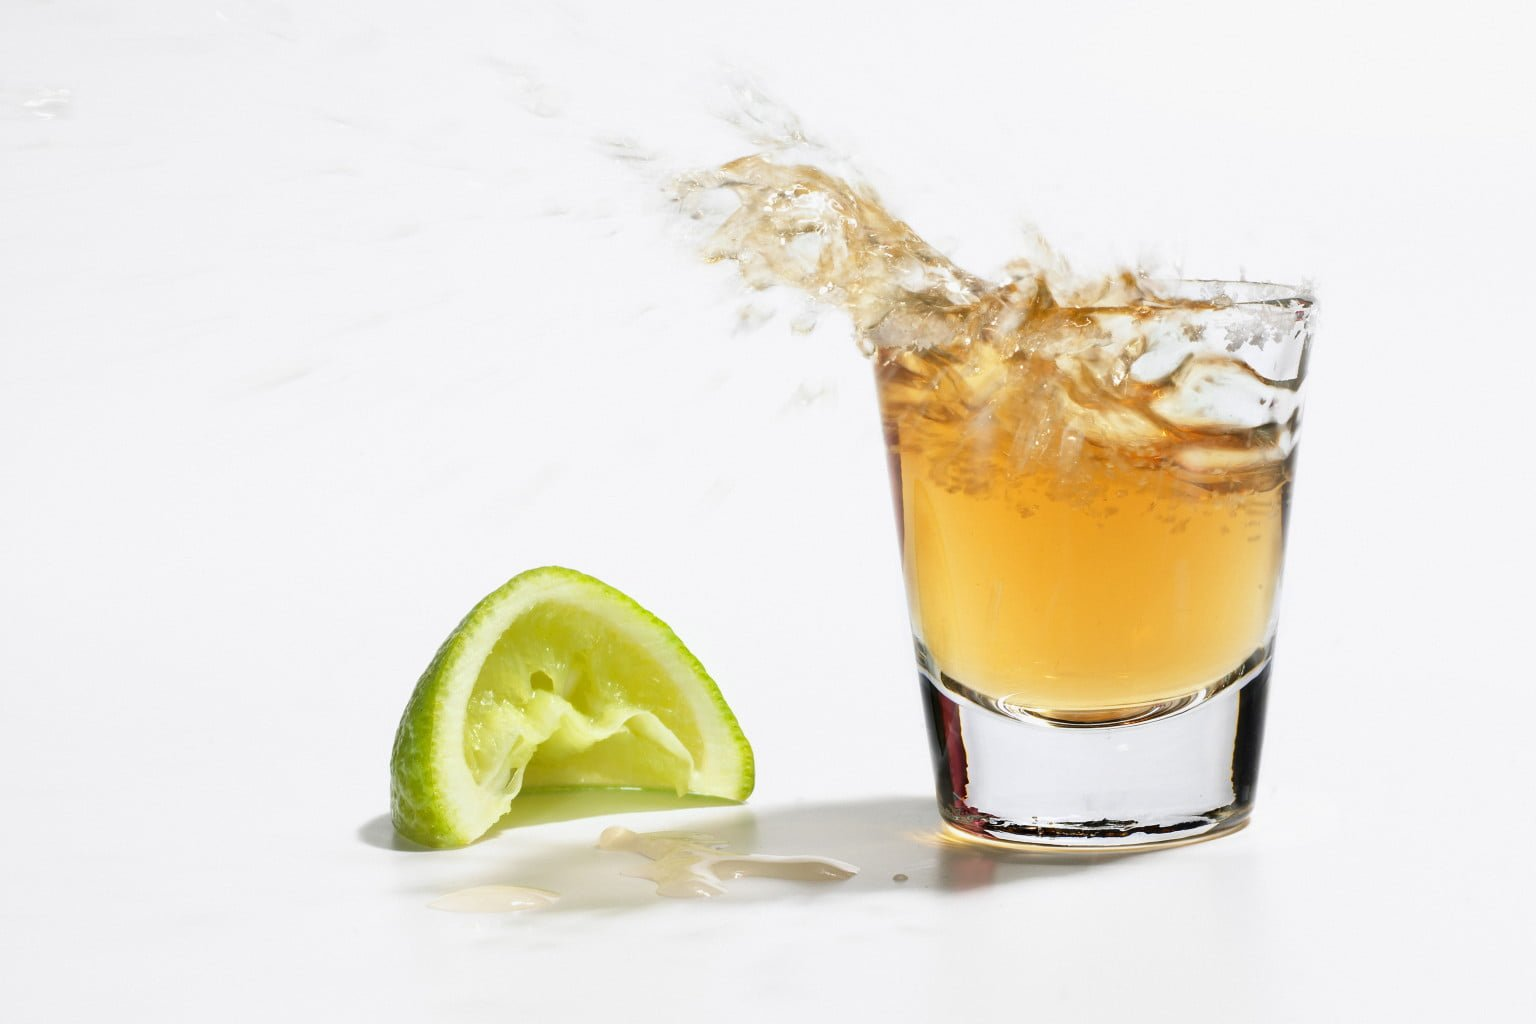 tequila benefits